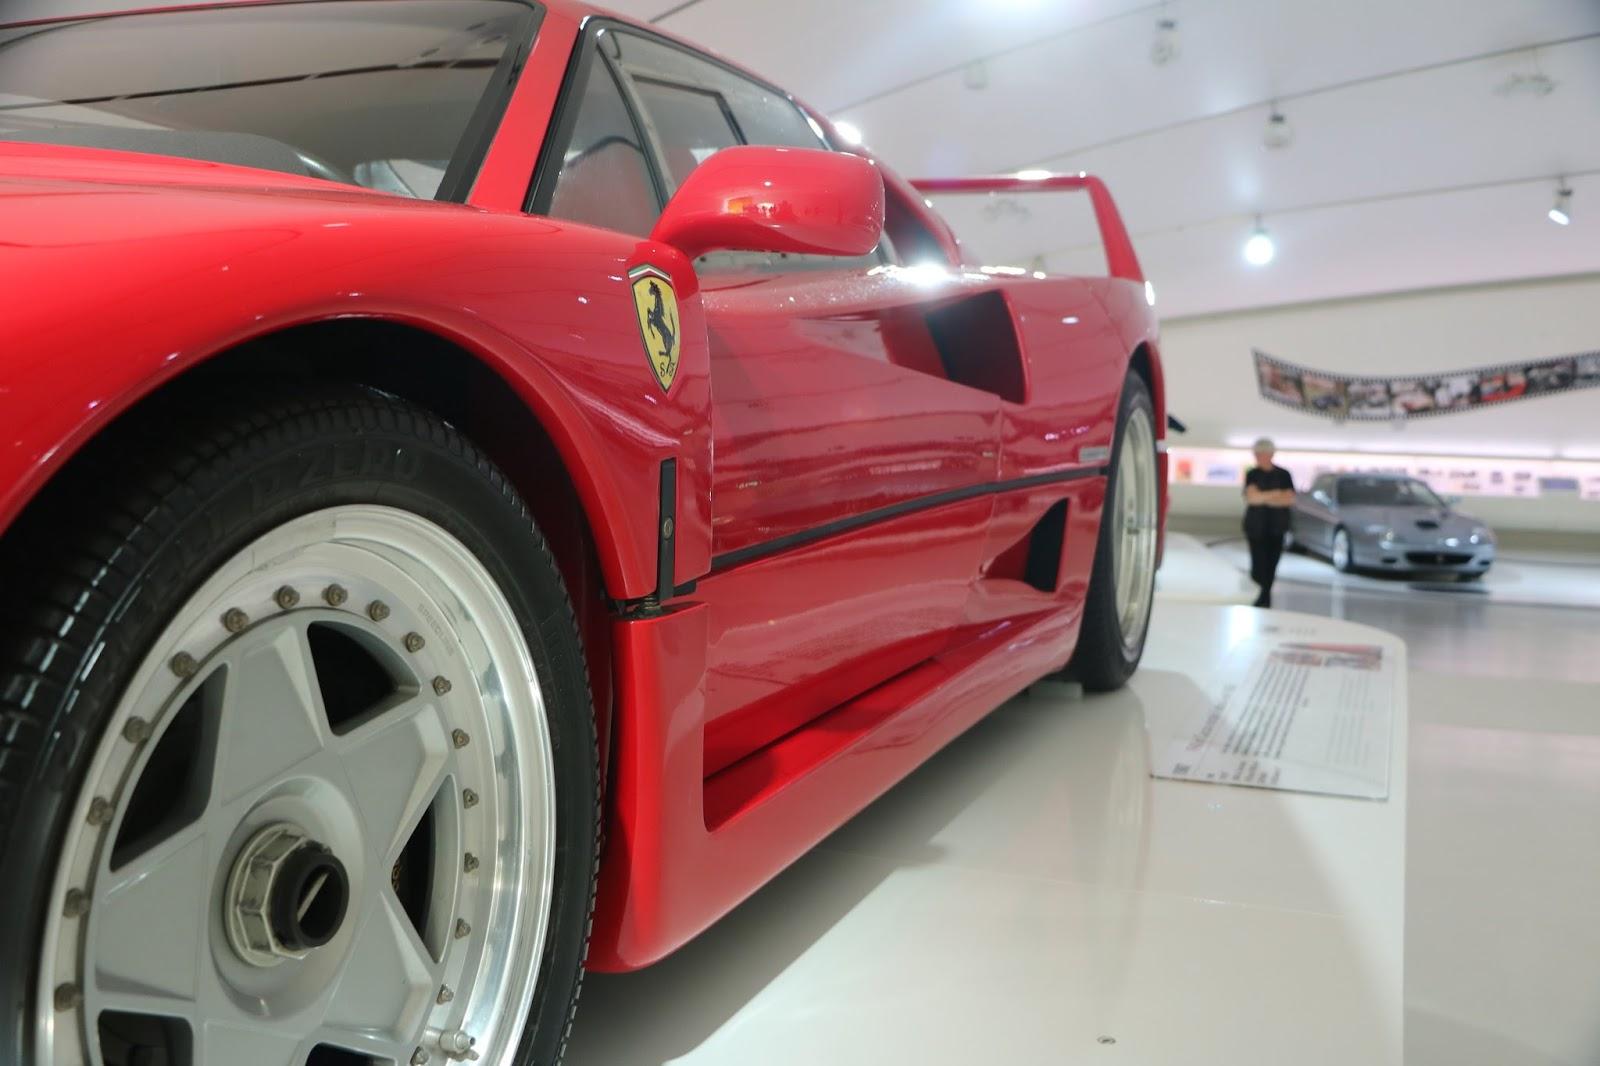 Modena - Enzo Museum 0017 - Ferrari F40.jpg